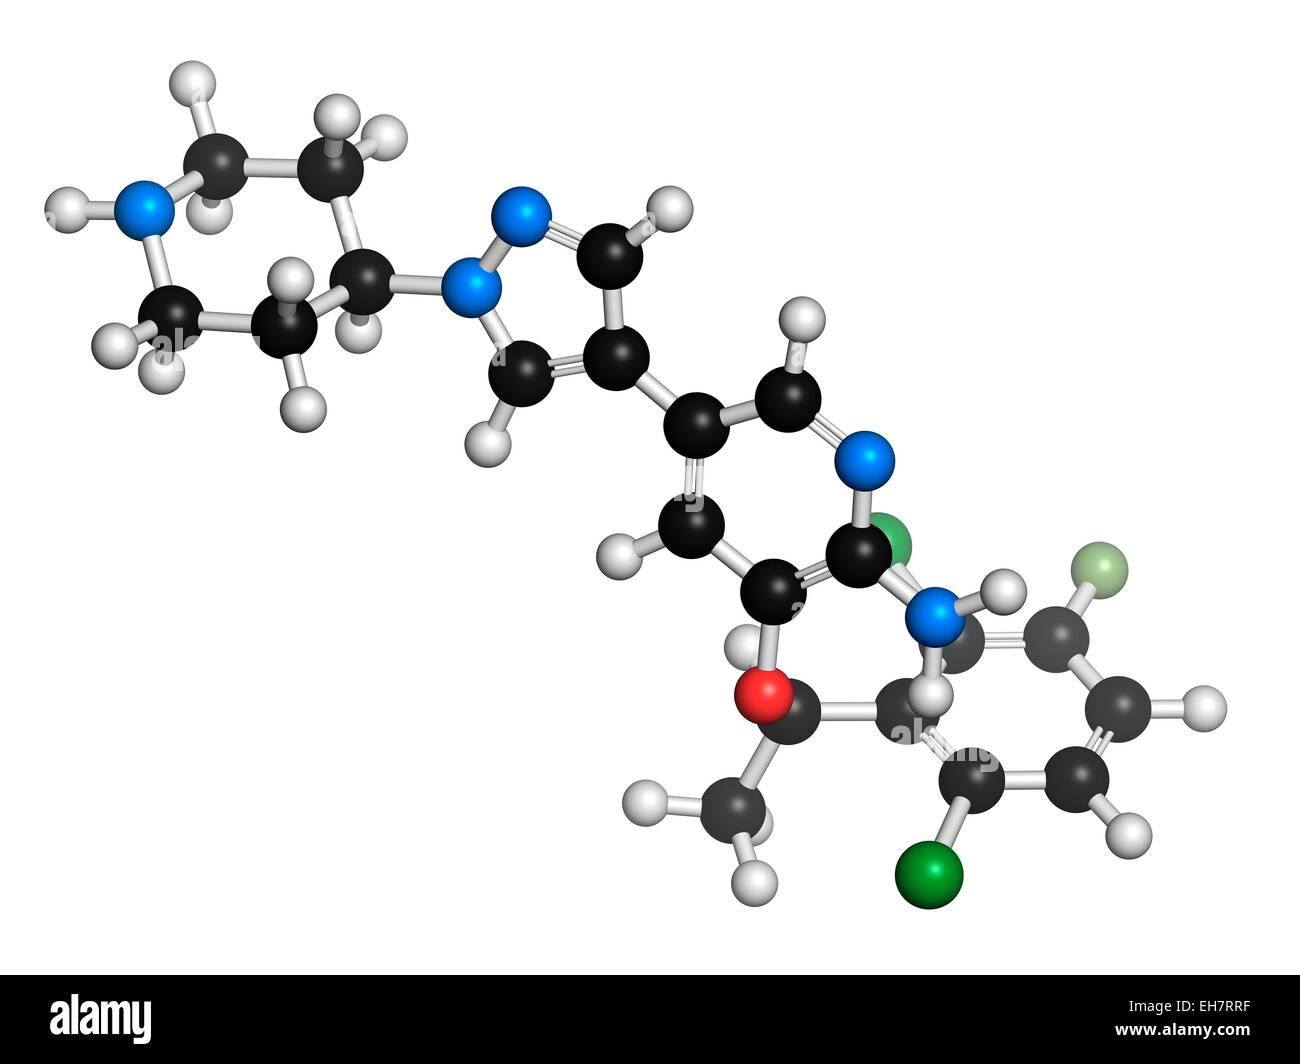 Crizotinib anti-cancer drug molecule - Stock Image